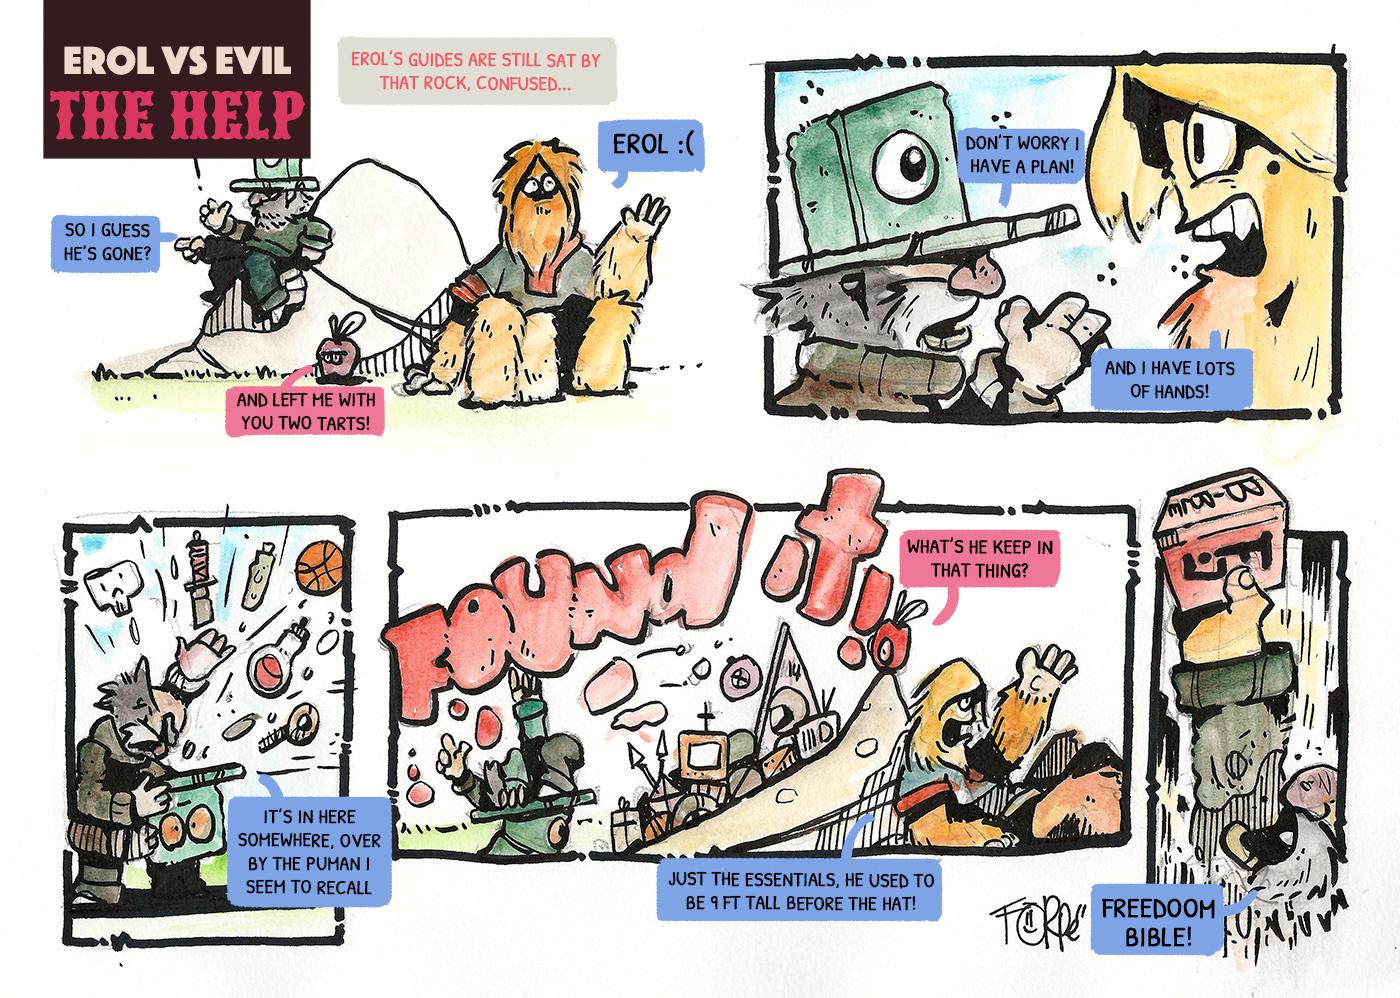 Erol-vs-evil-burgers-forpe-41.jpg